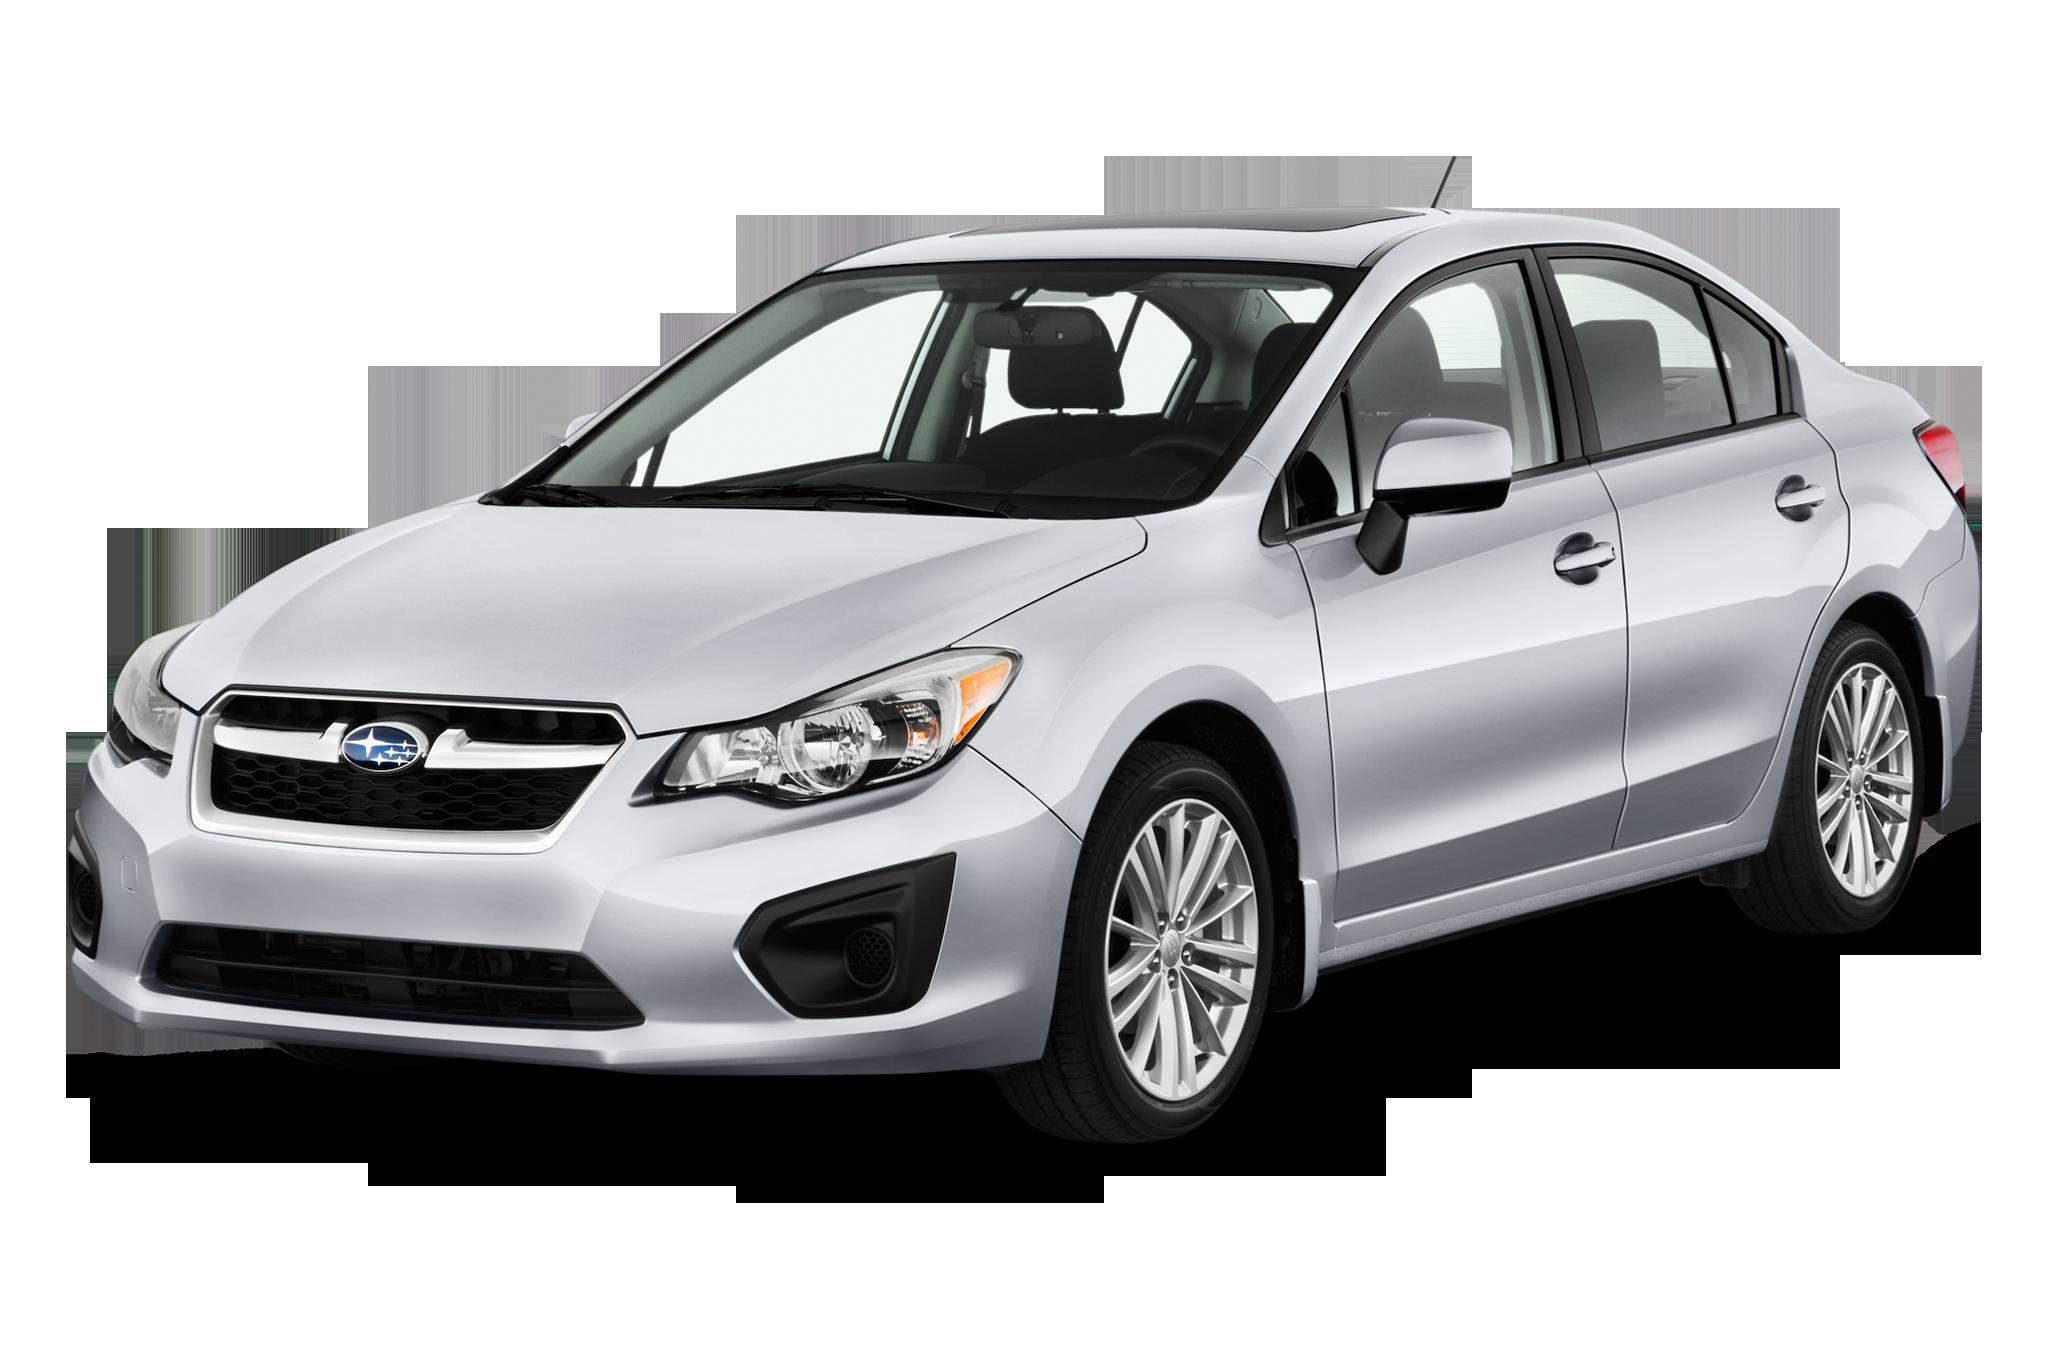 2013 subaru impreza 2 0i (pzev) sedan specs and features msn autos 2019 Subaru Impreza Premium Sedan 2013 subaru impreza